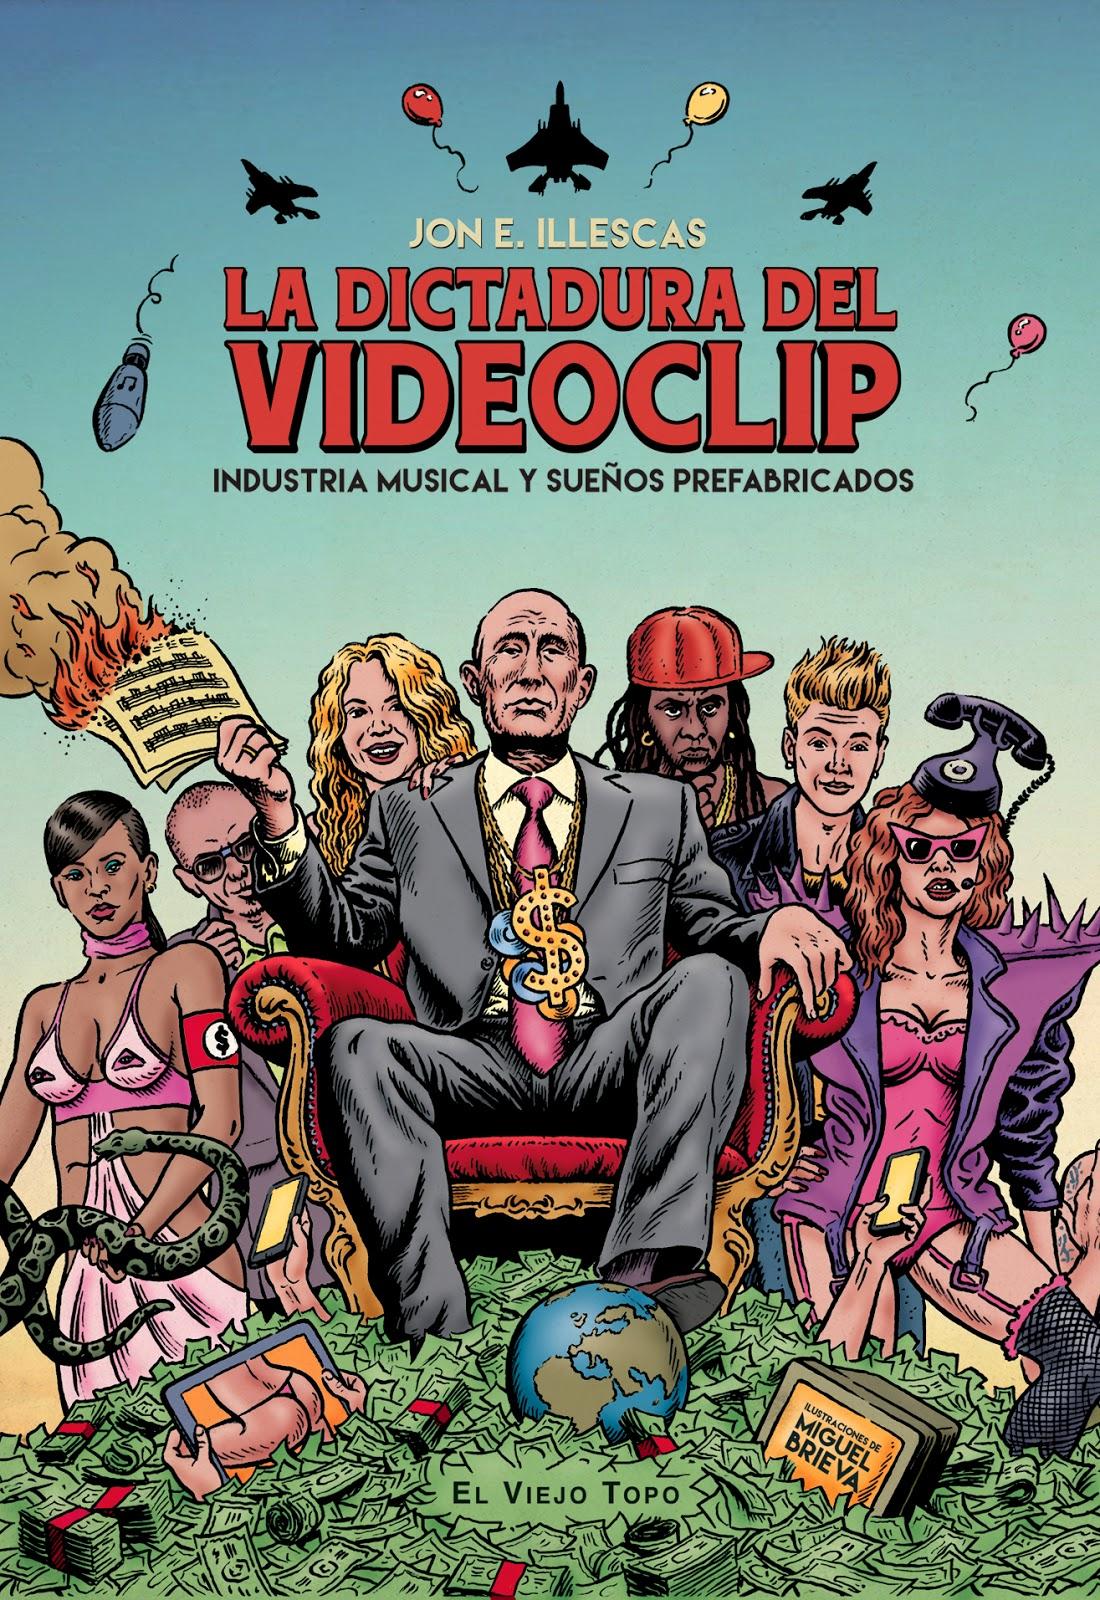 La+Dictadura+del+Videoclip+de+Jon+E.+Illescas+PORTADA+RGB